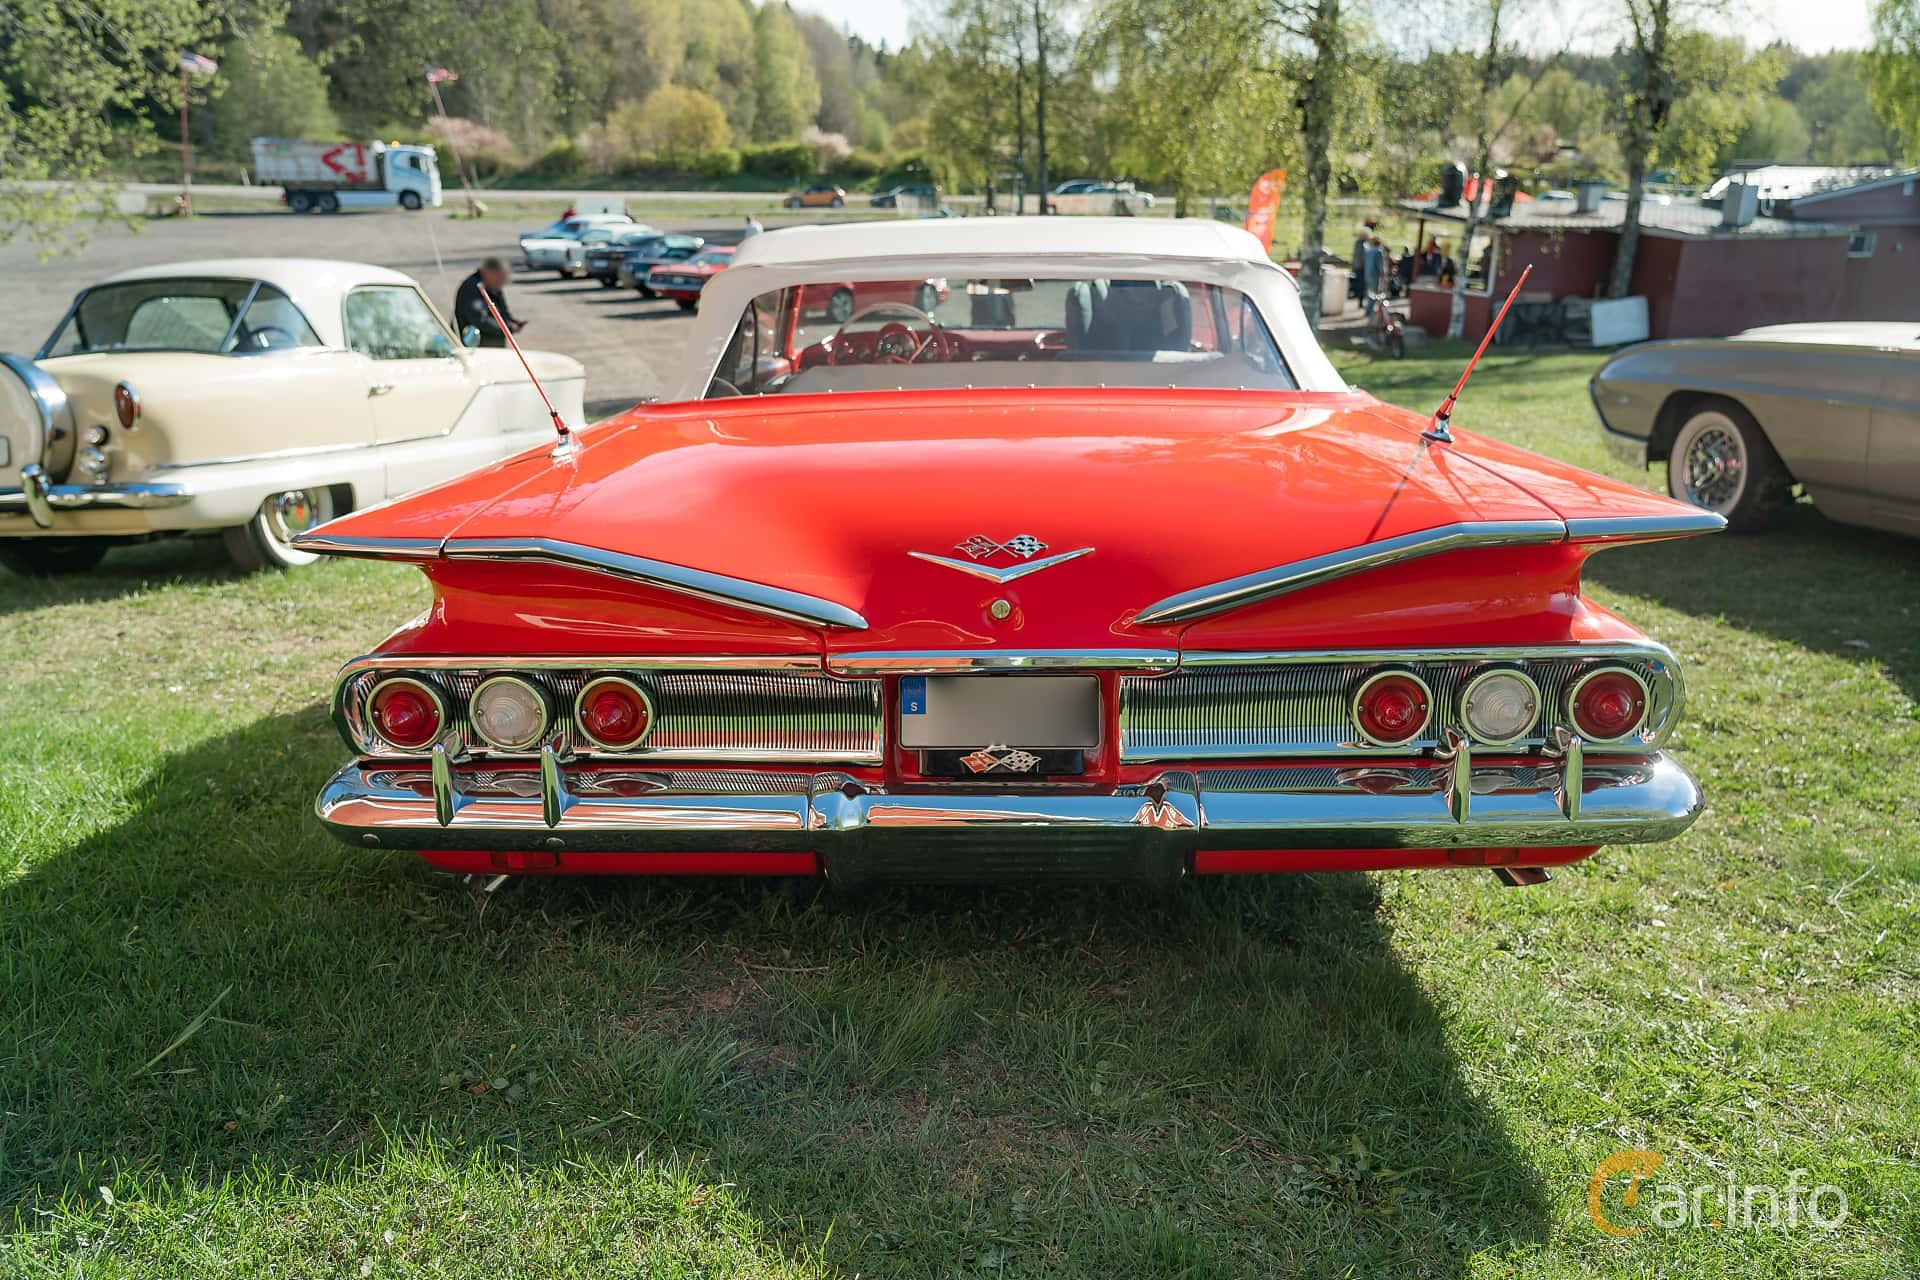 Chevrolet Impala Convertible 5.7 V8 Powerglide, 324hp, 1960 at Lissma Classic Car 2019 vecka 20